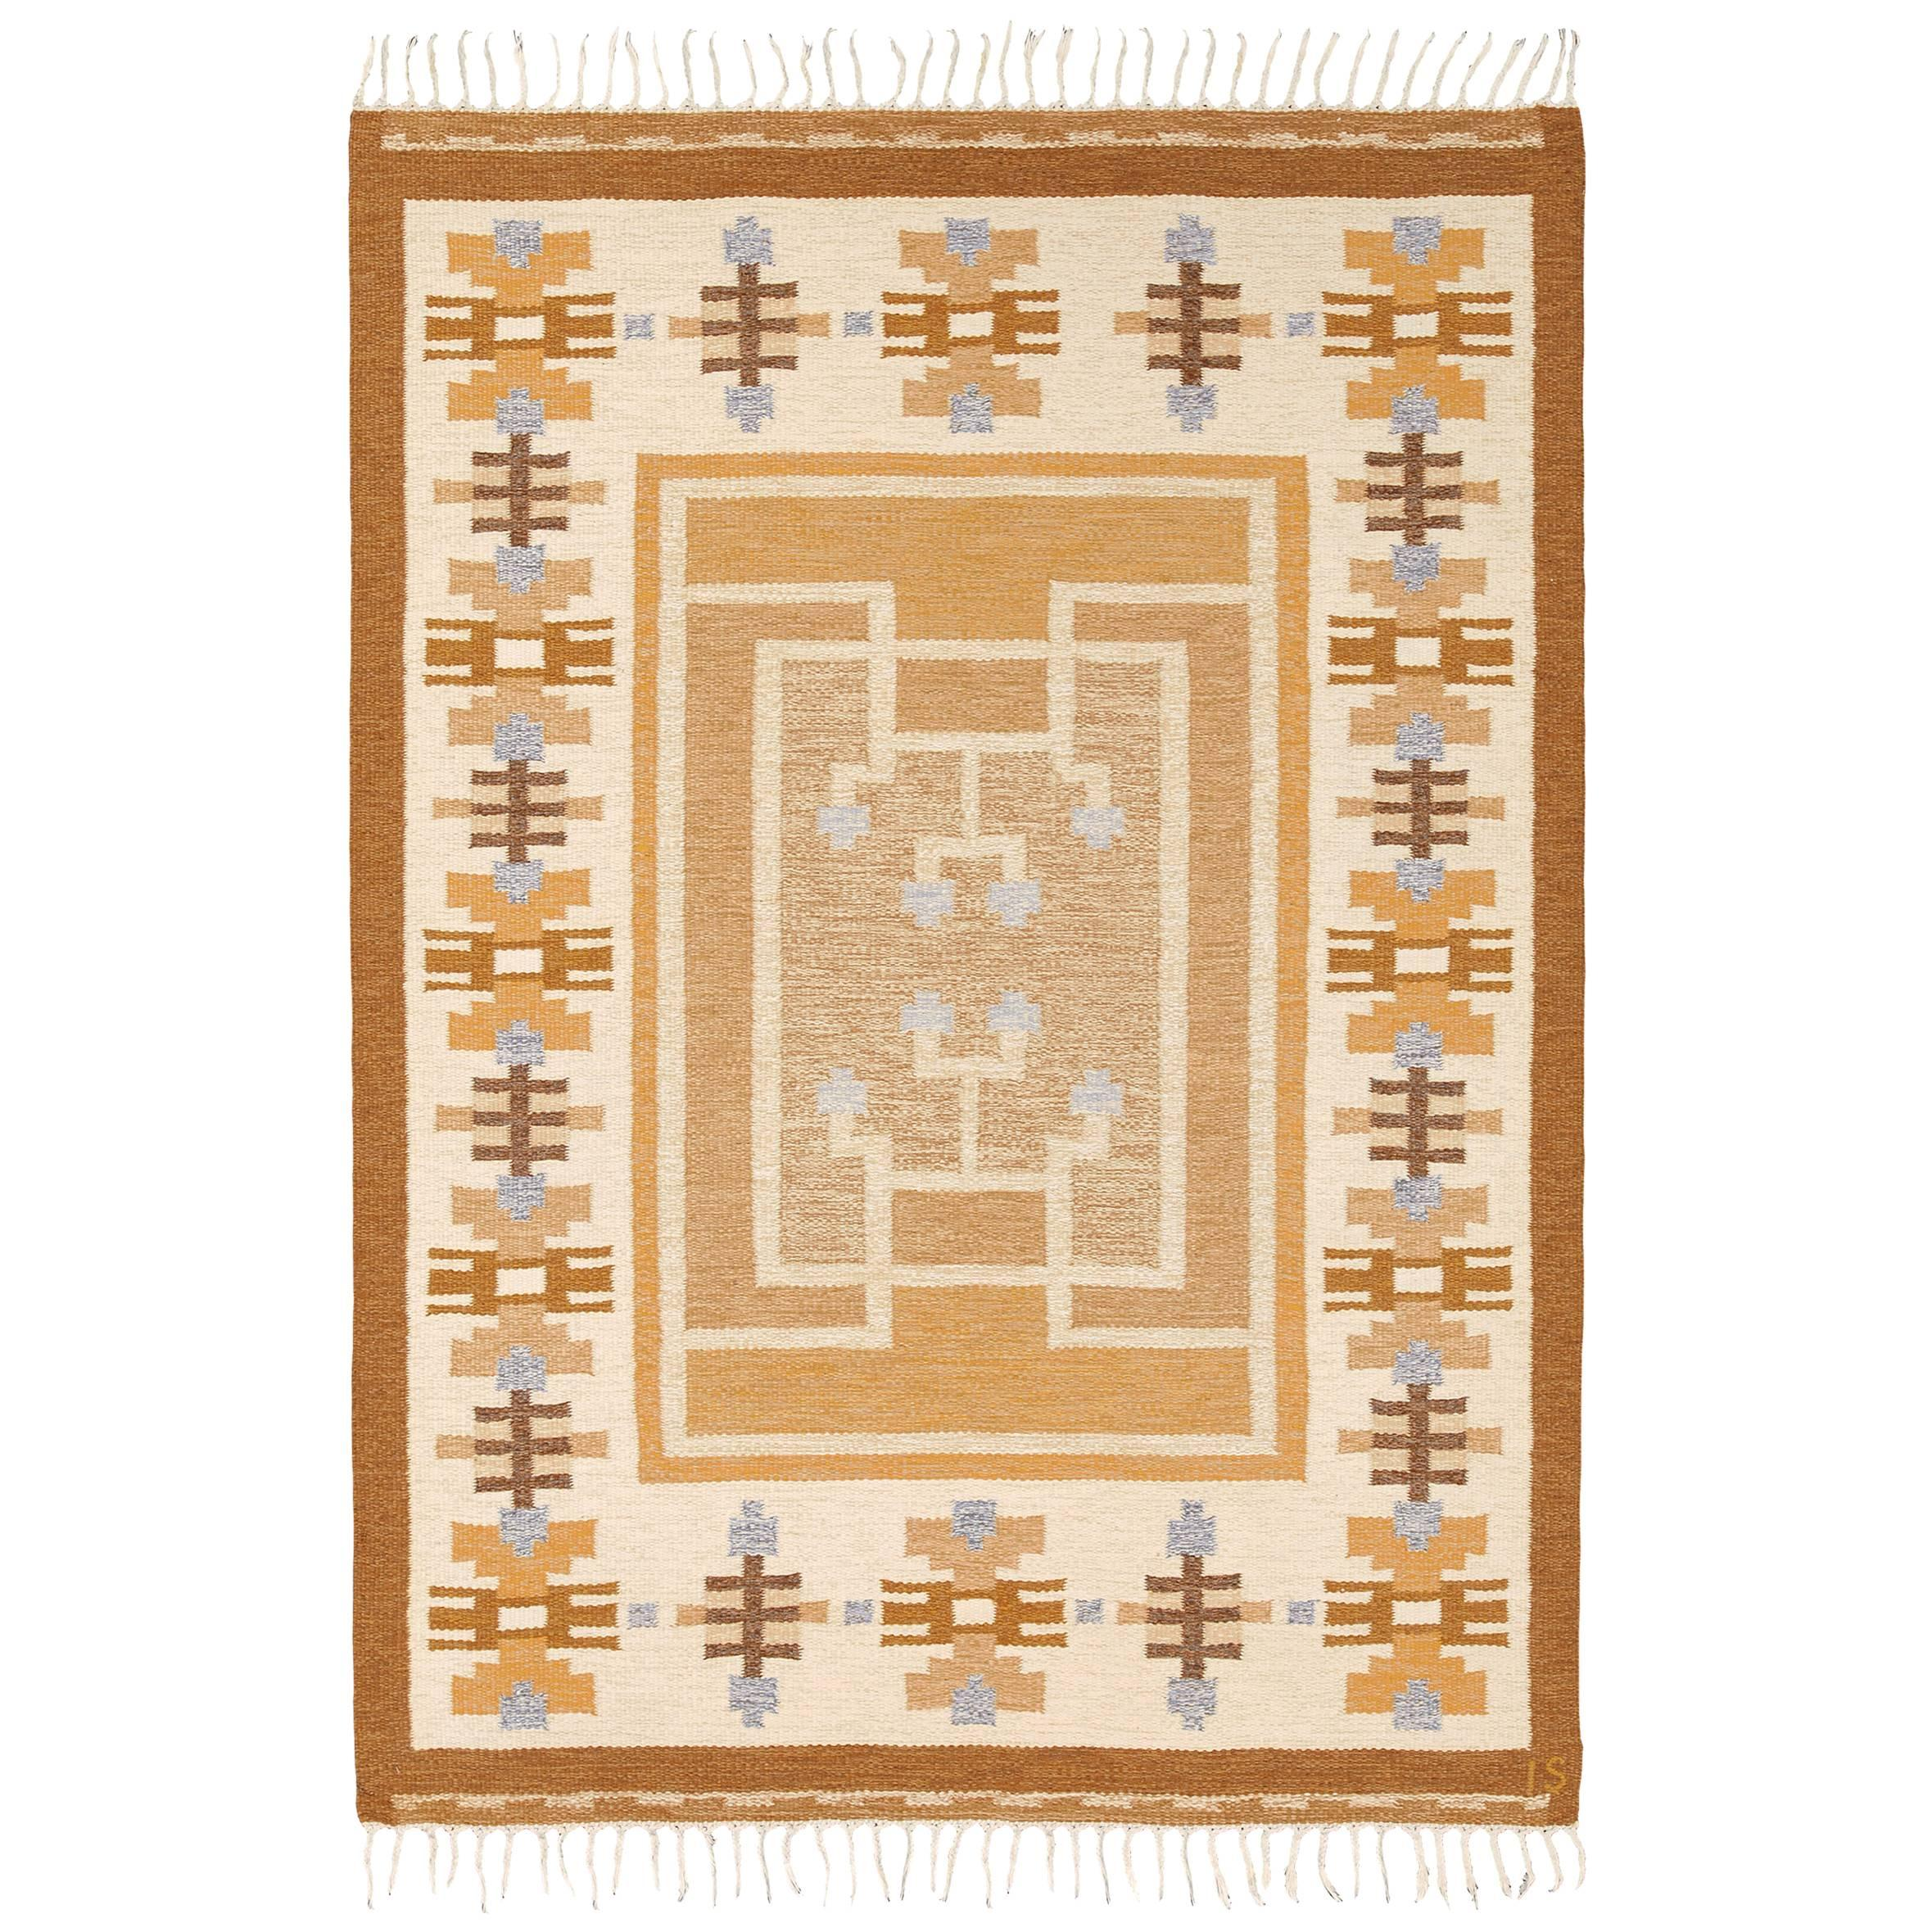 Mid 20th Century Swedish Flat-Weave Carpet by Ingegerd Silow